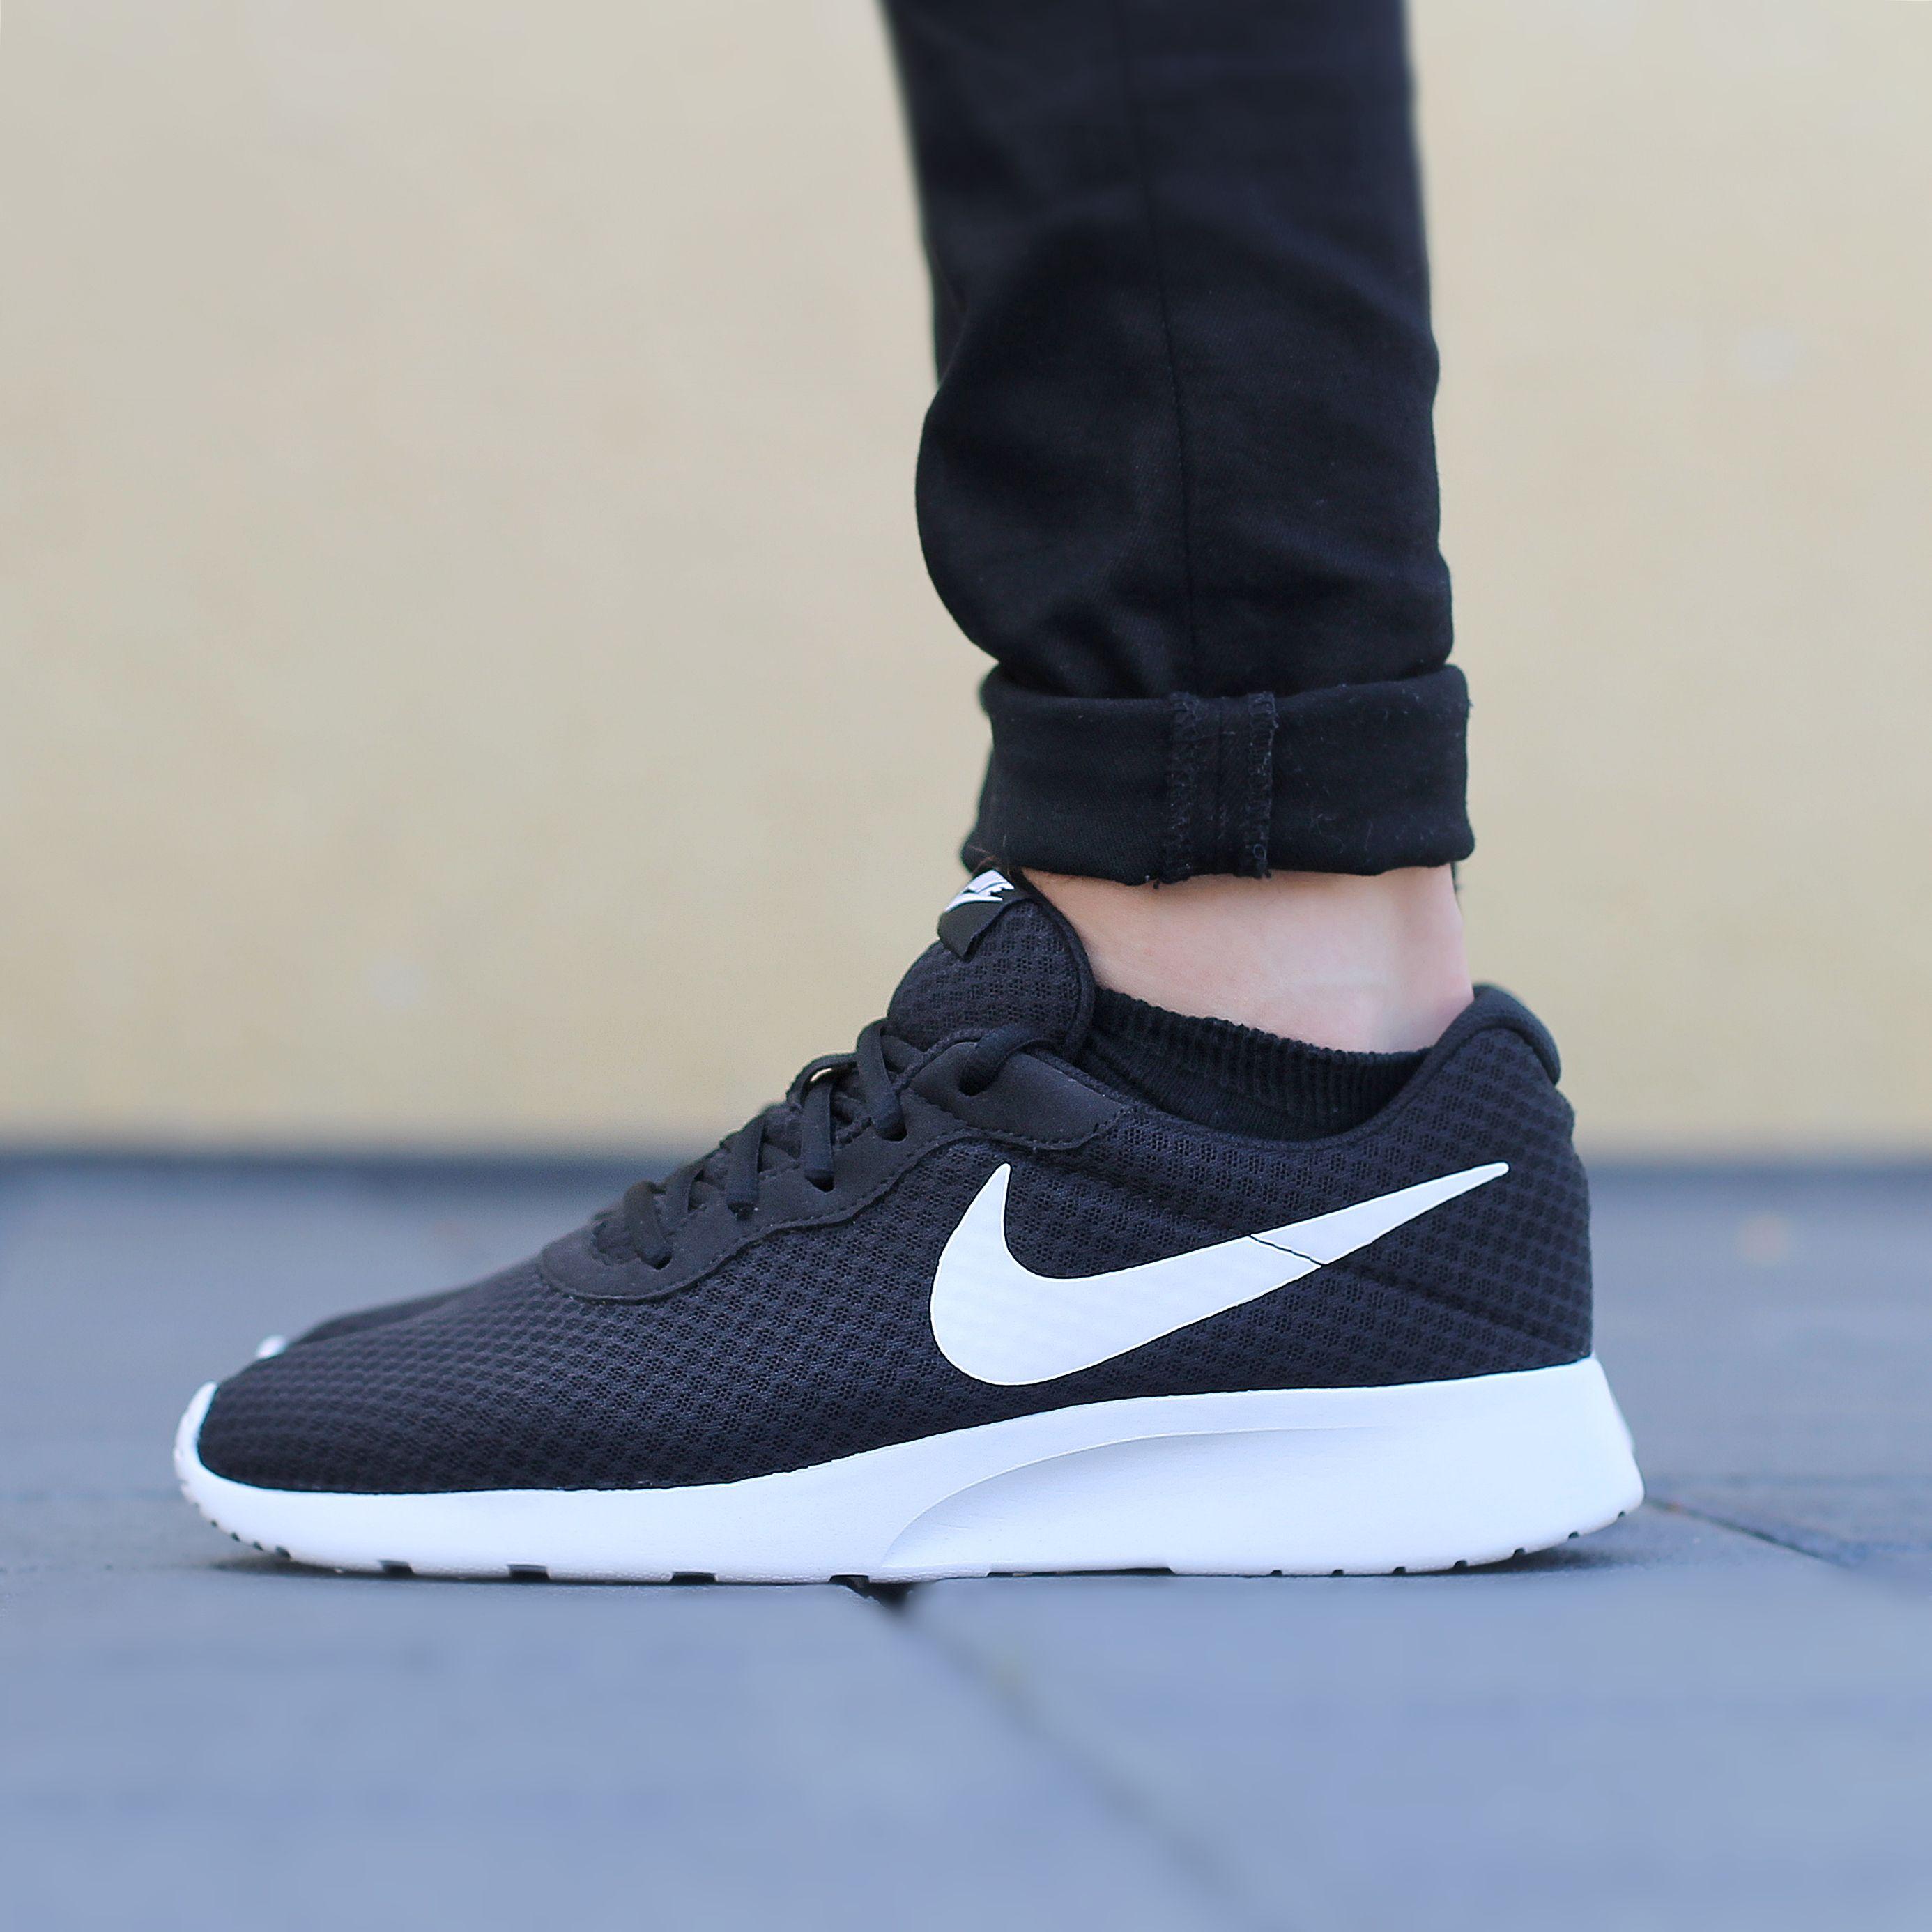 Nike Tanjun Black Sneaker Fur Herren Bei Deichmann Http Deich Mn 29edff Nur 64 90 Deichmann Sch Nike Schuhe Herren Nike Schuhe Damen Nike Schuhe